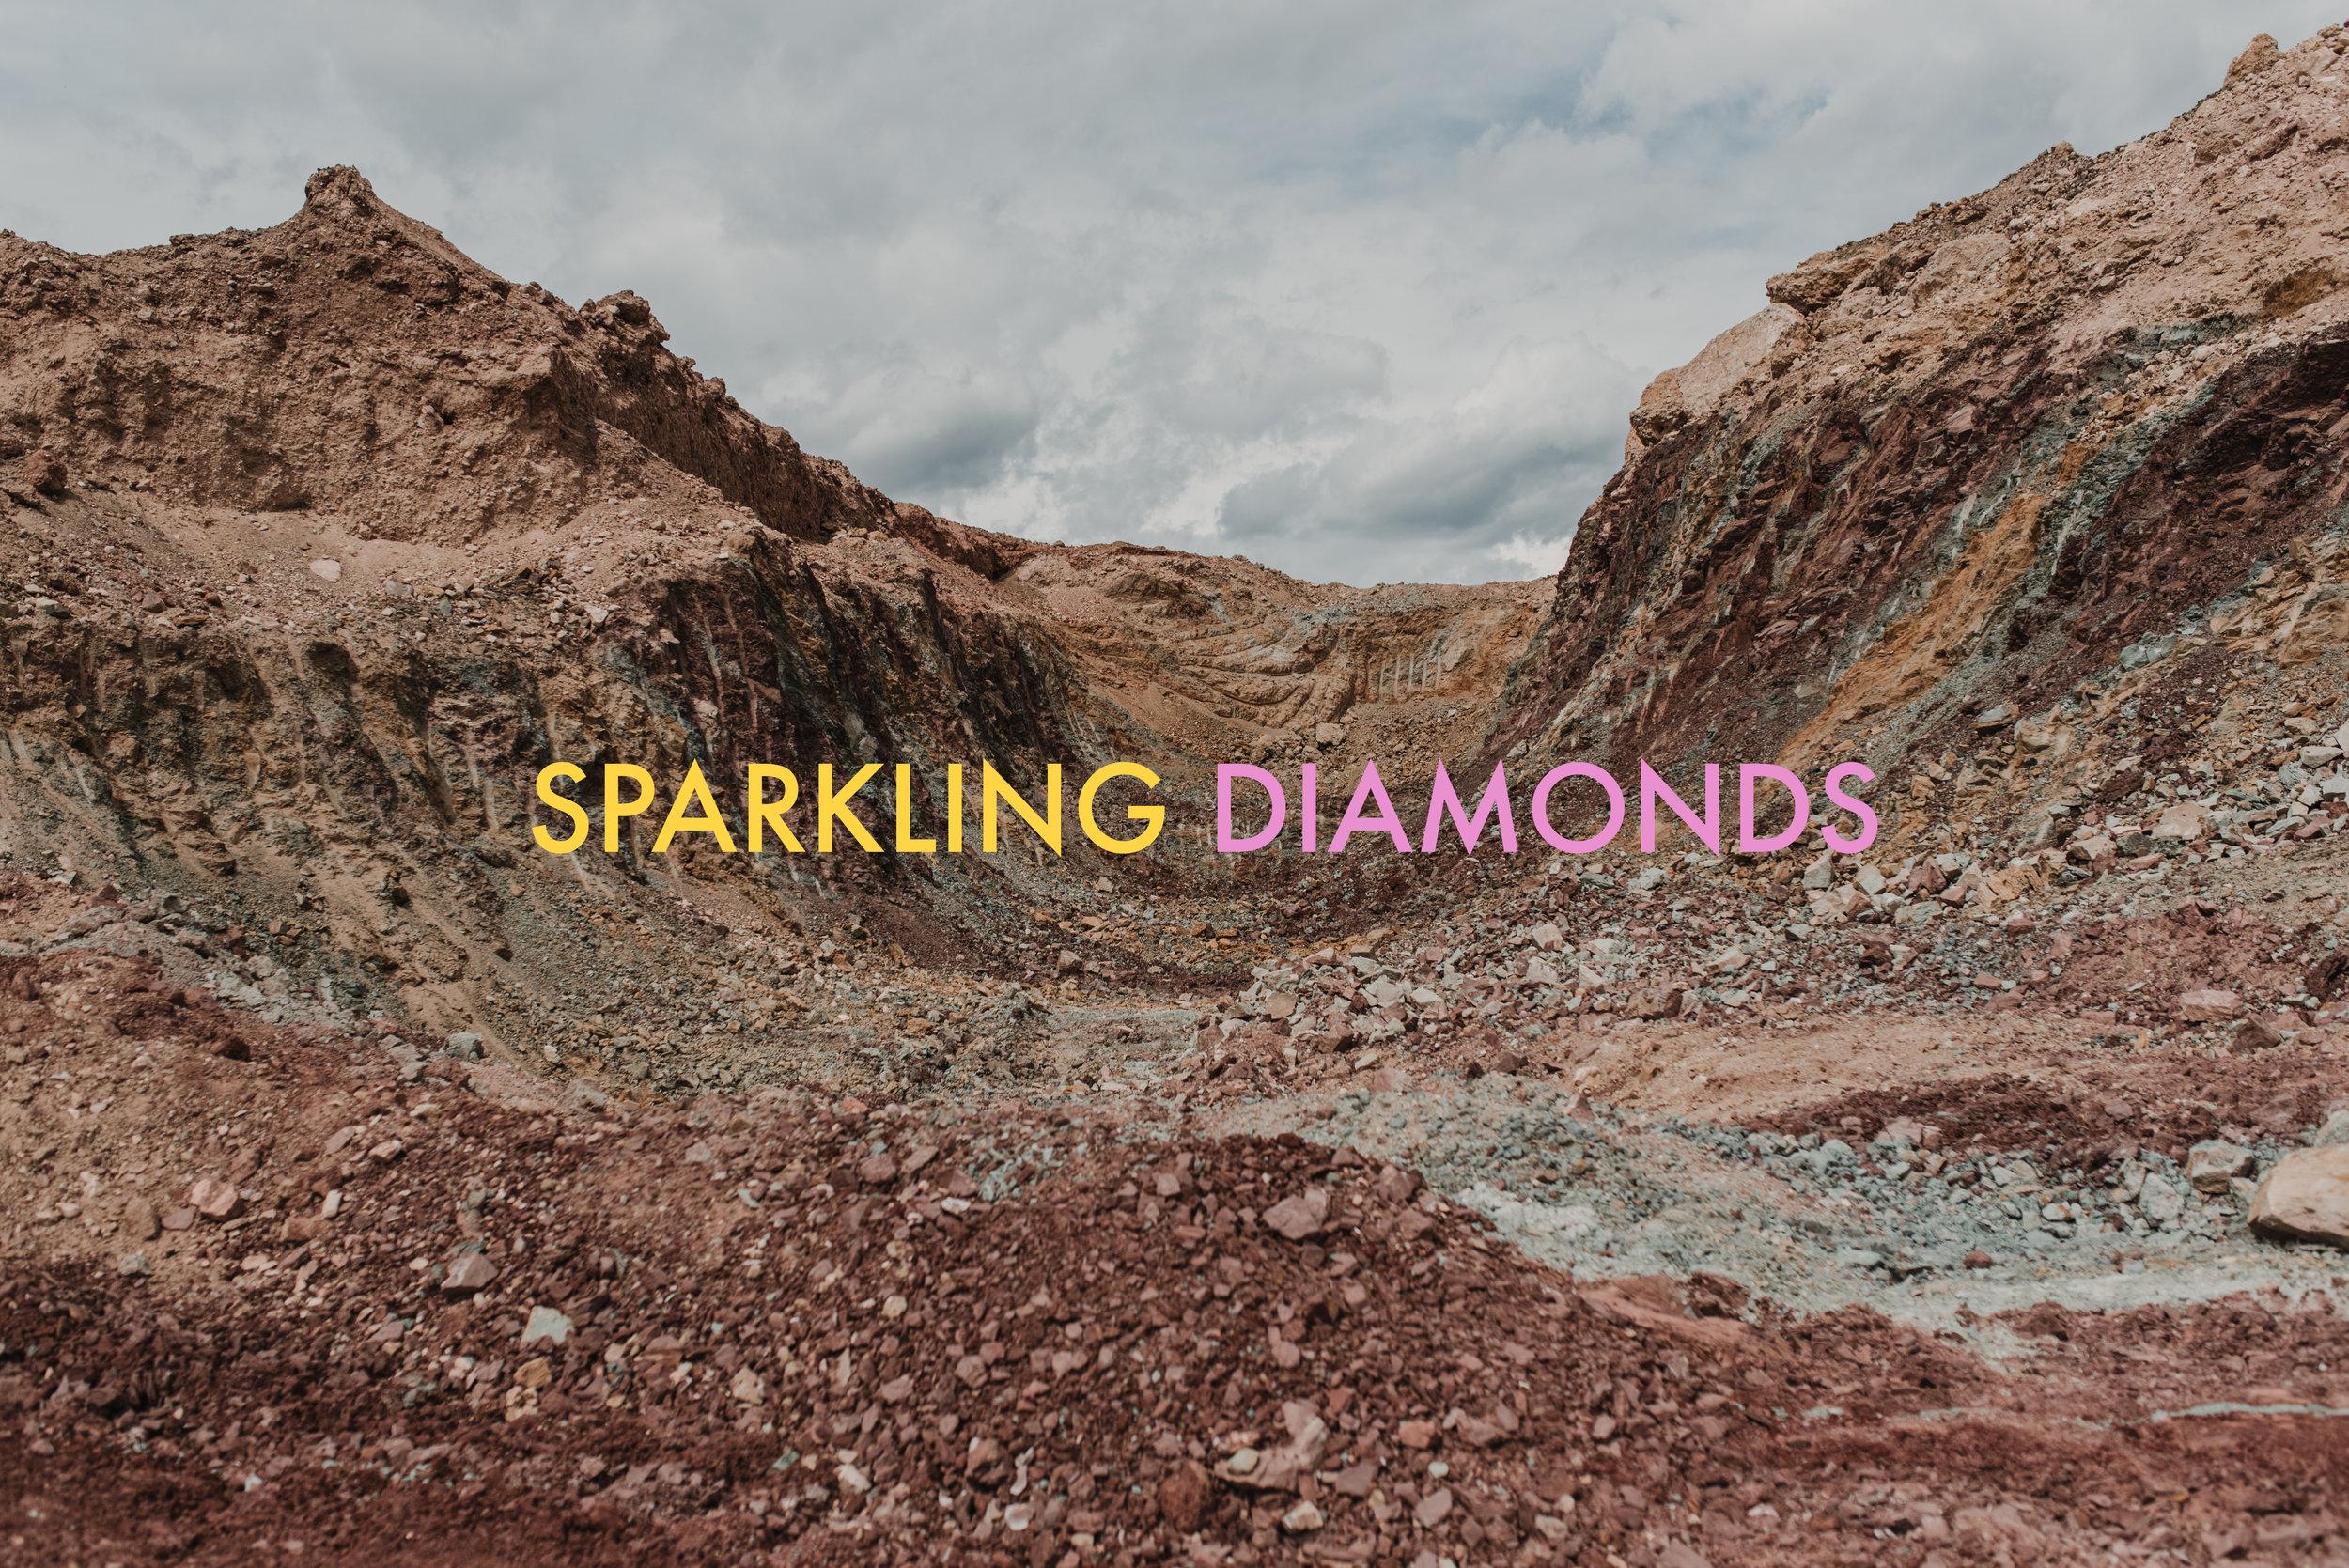 Sparkling Diamonds(C)Pati Gagarin 2019 01.jpg